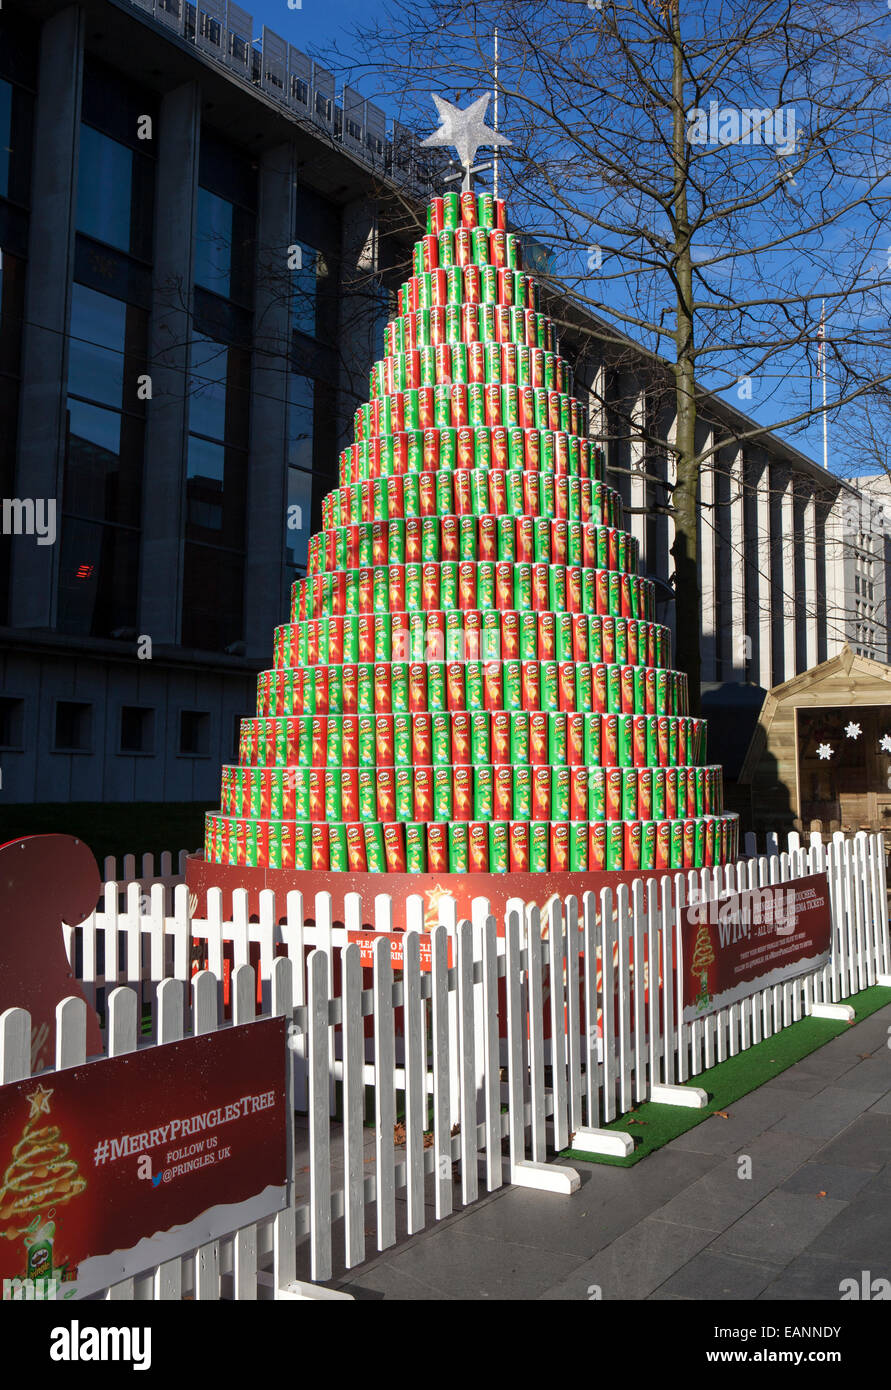 The Pringles Crisps Pyramid Tower